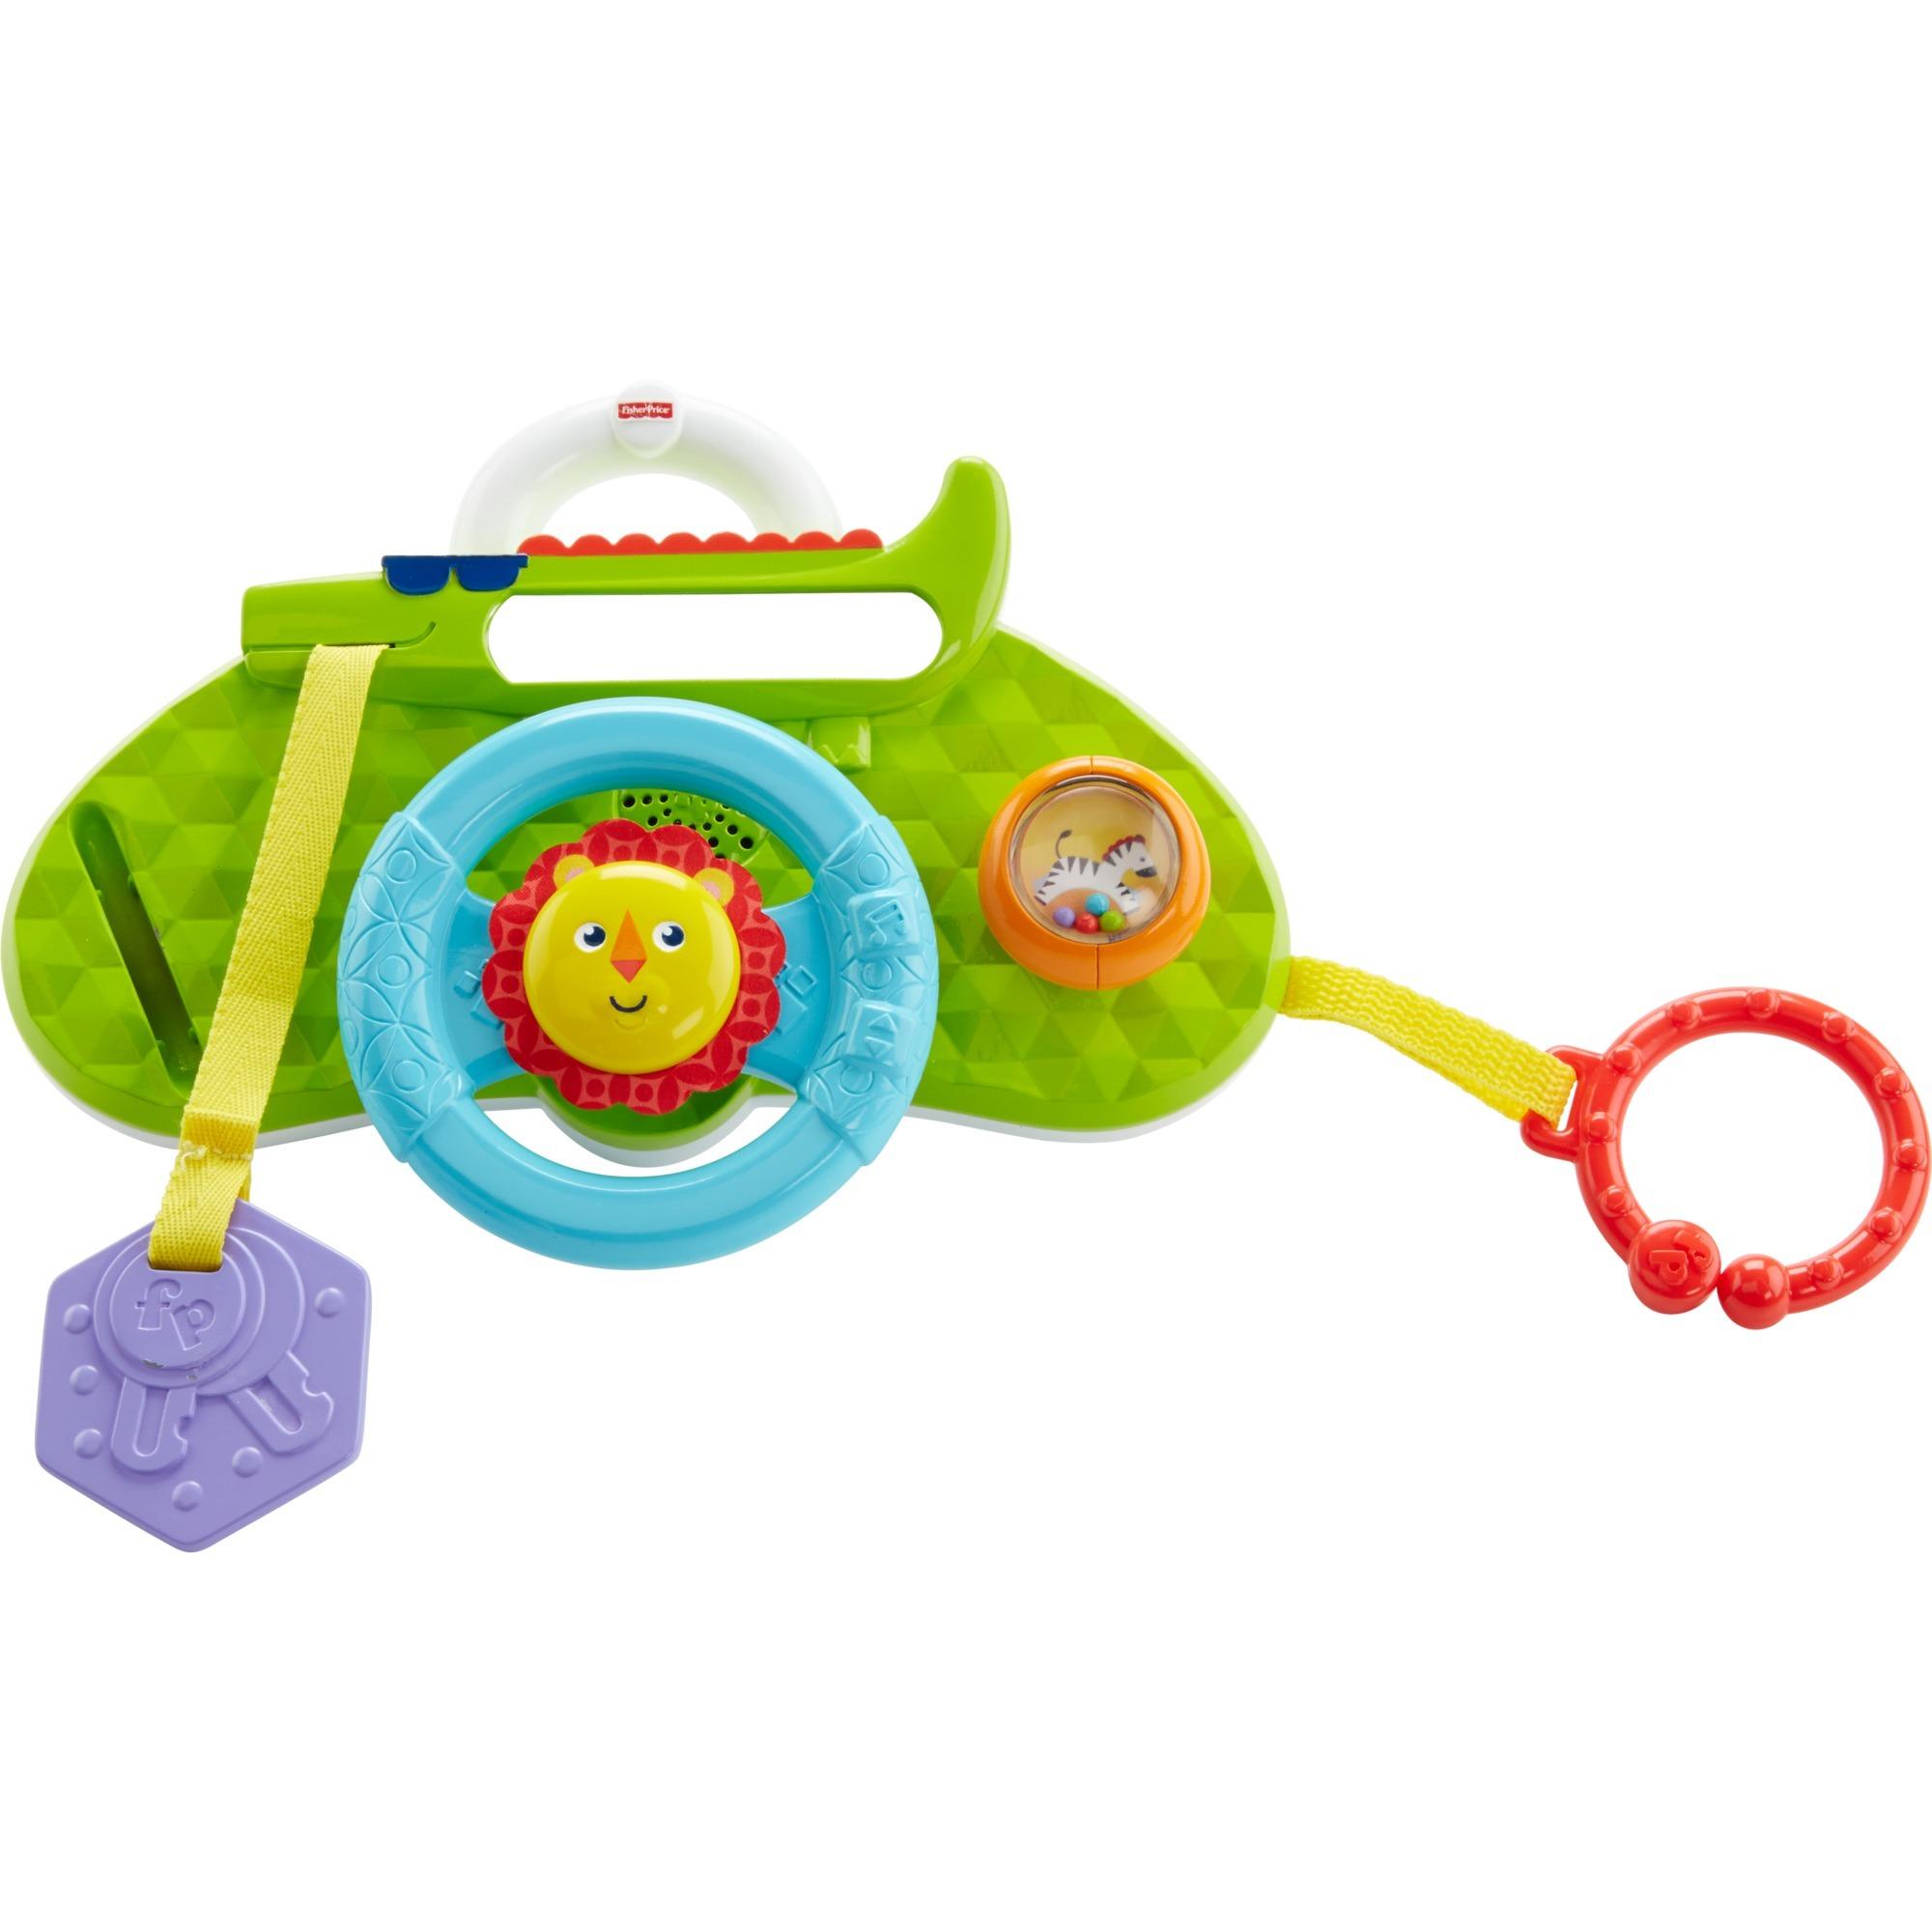 DYW53 jouet interactif, Jeu d'adresse